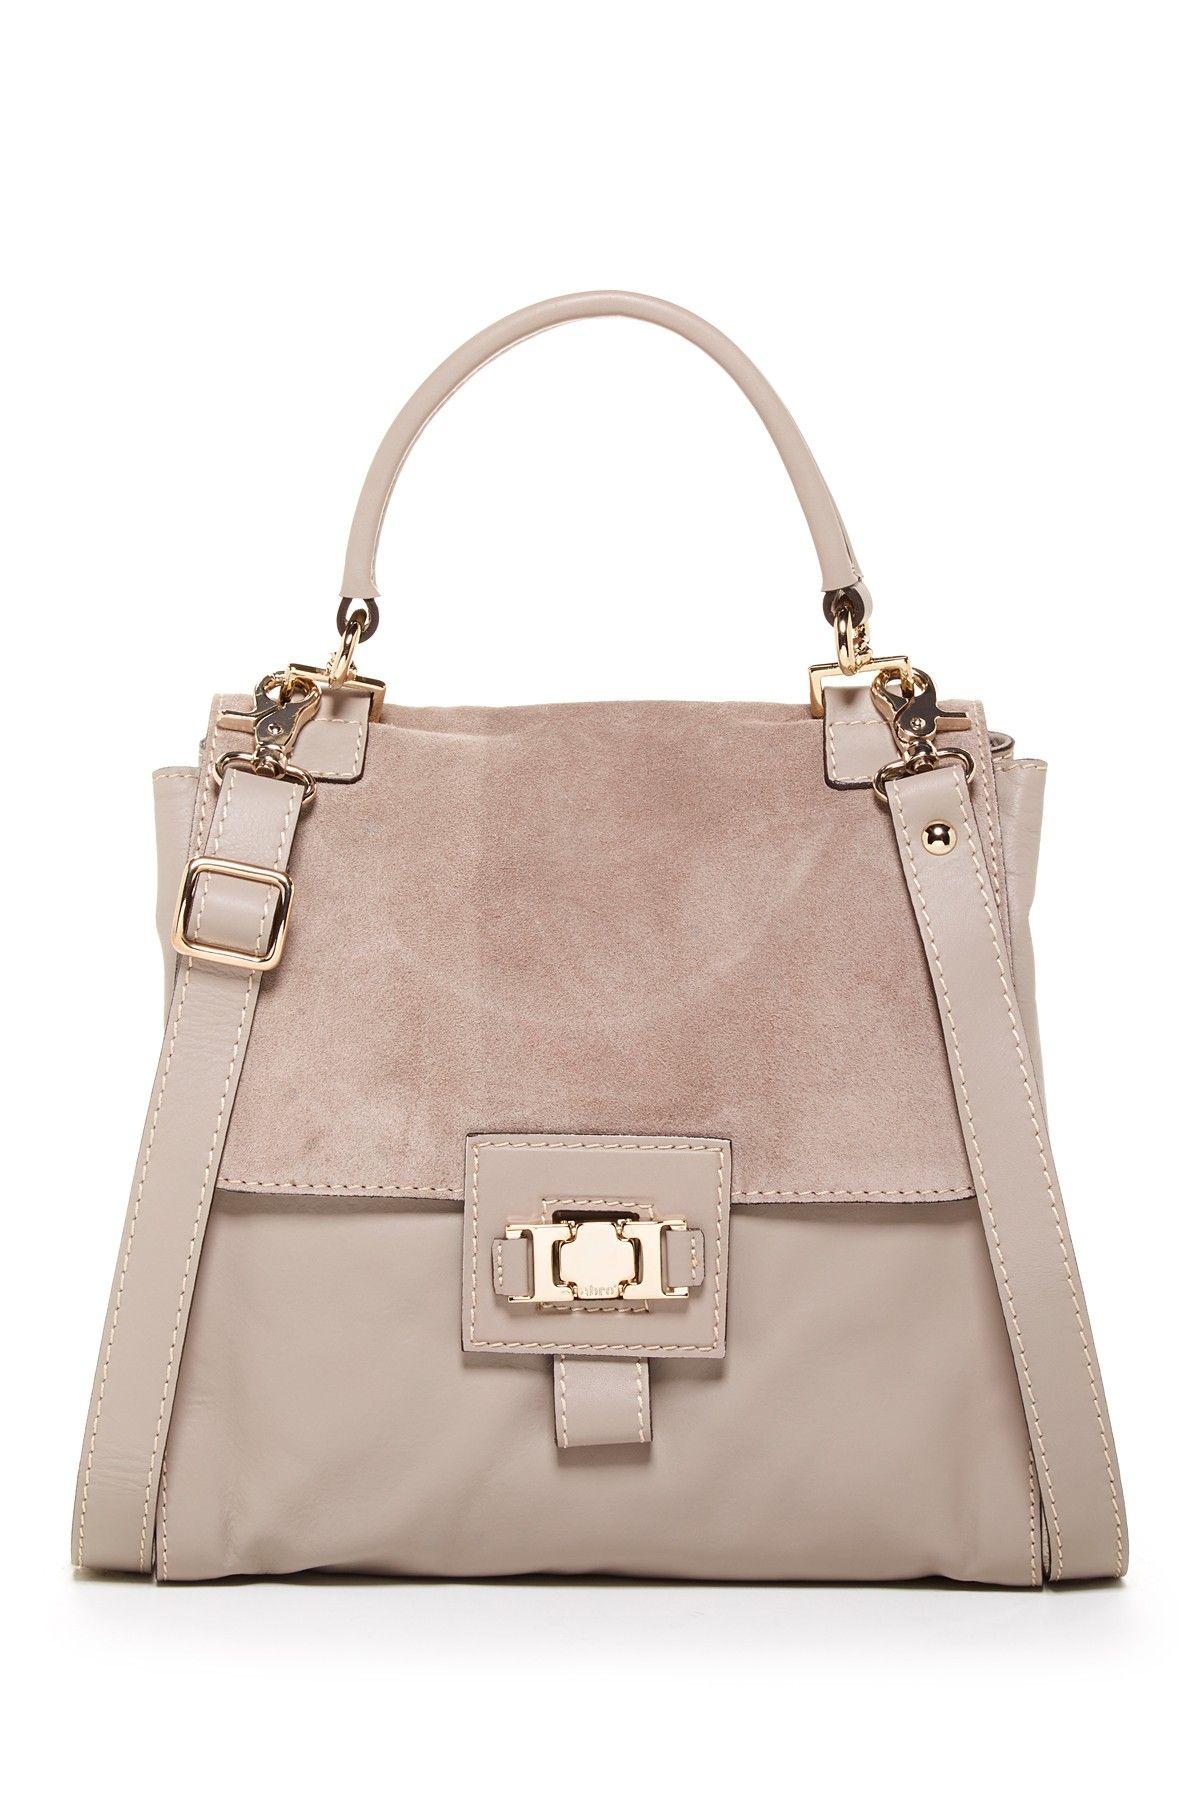 Abro Small Scholoss Tasche Satchel Bags Galore Bags Satchel